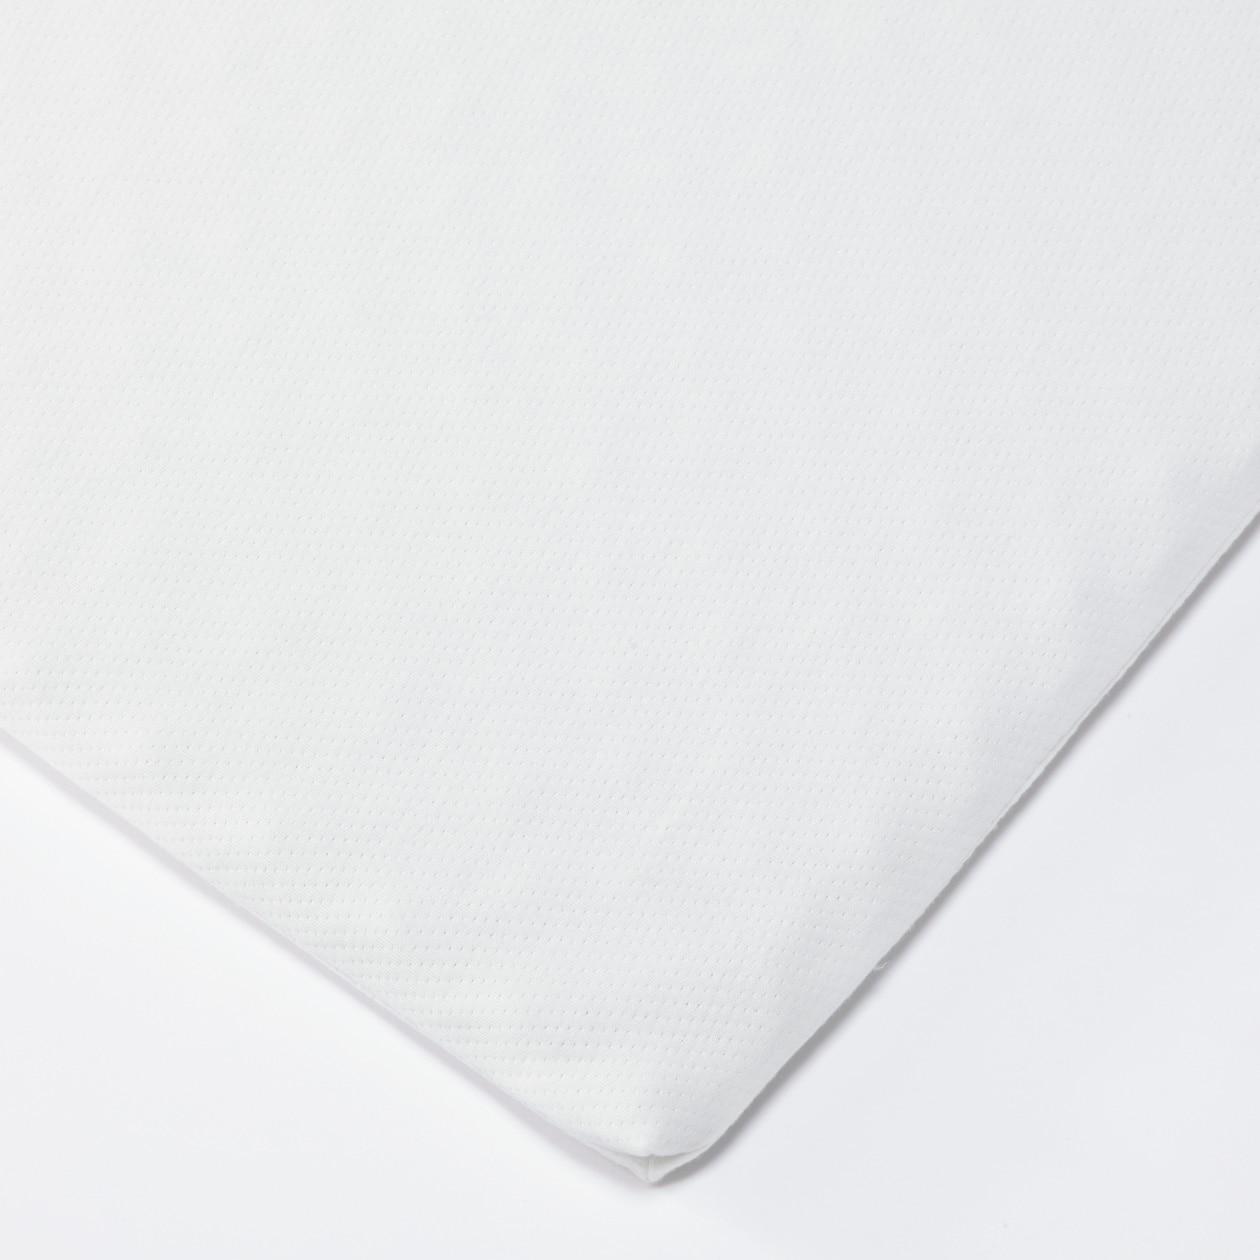 RoomClip商品情報 - 体圧分散ウレタンマット・やわらかめ/SD